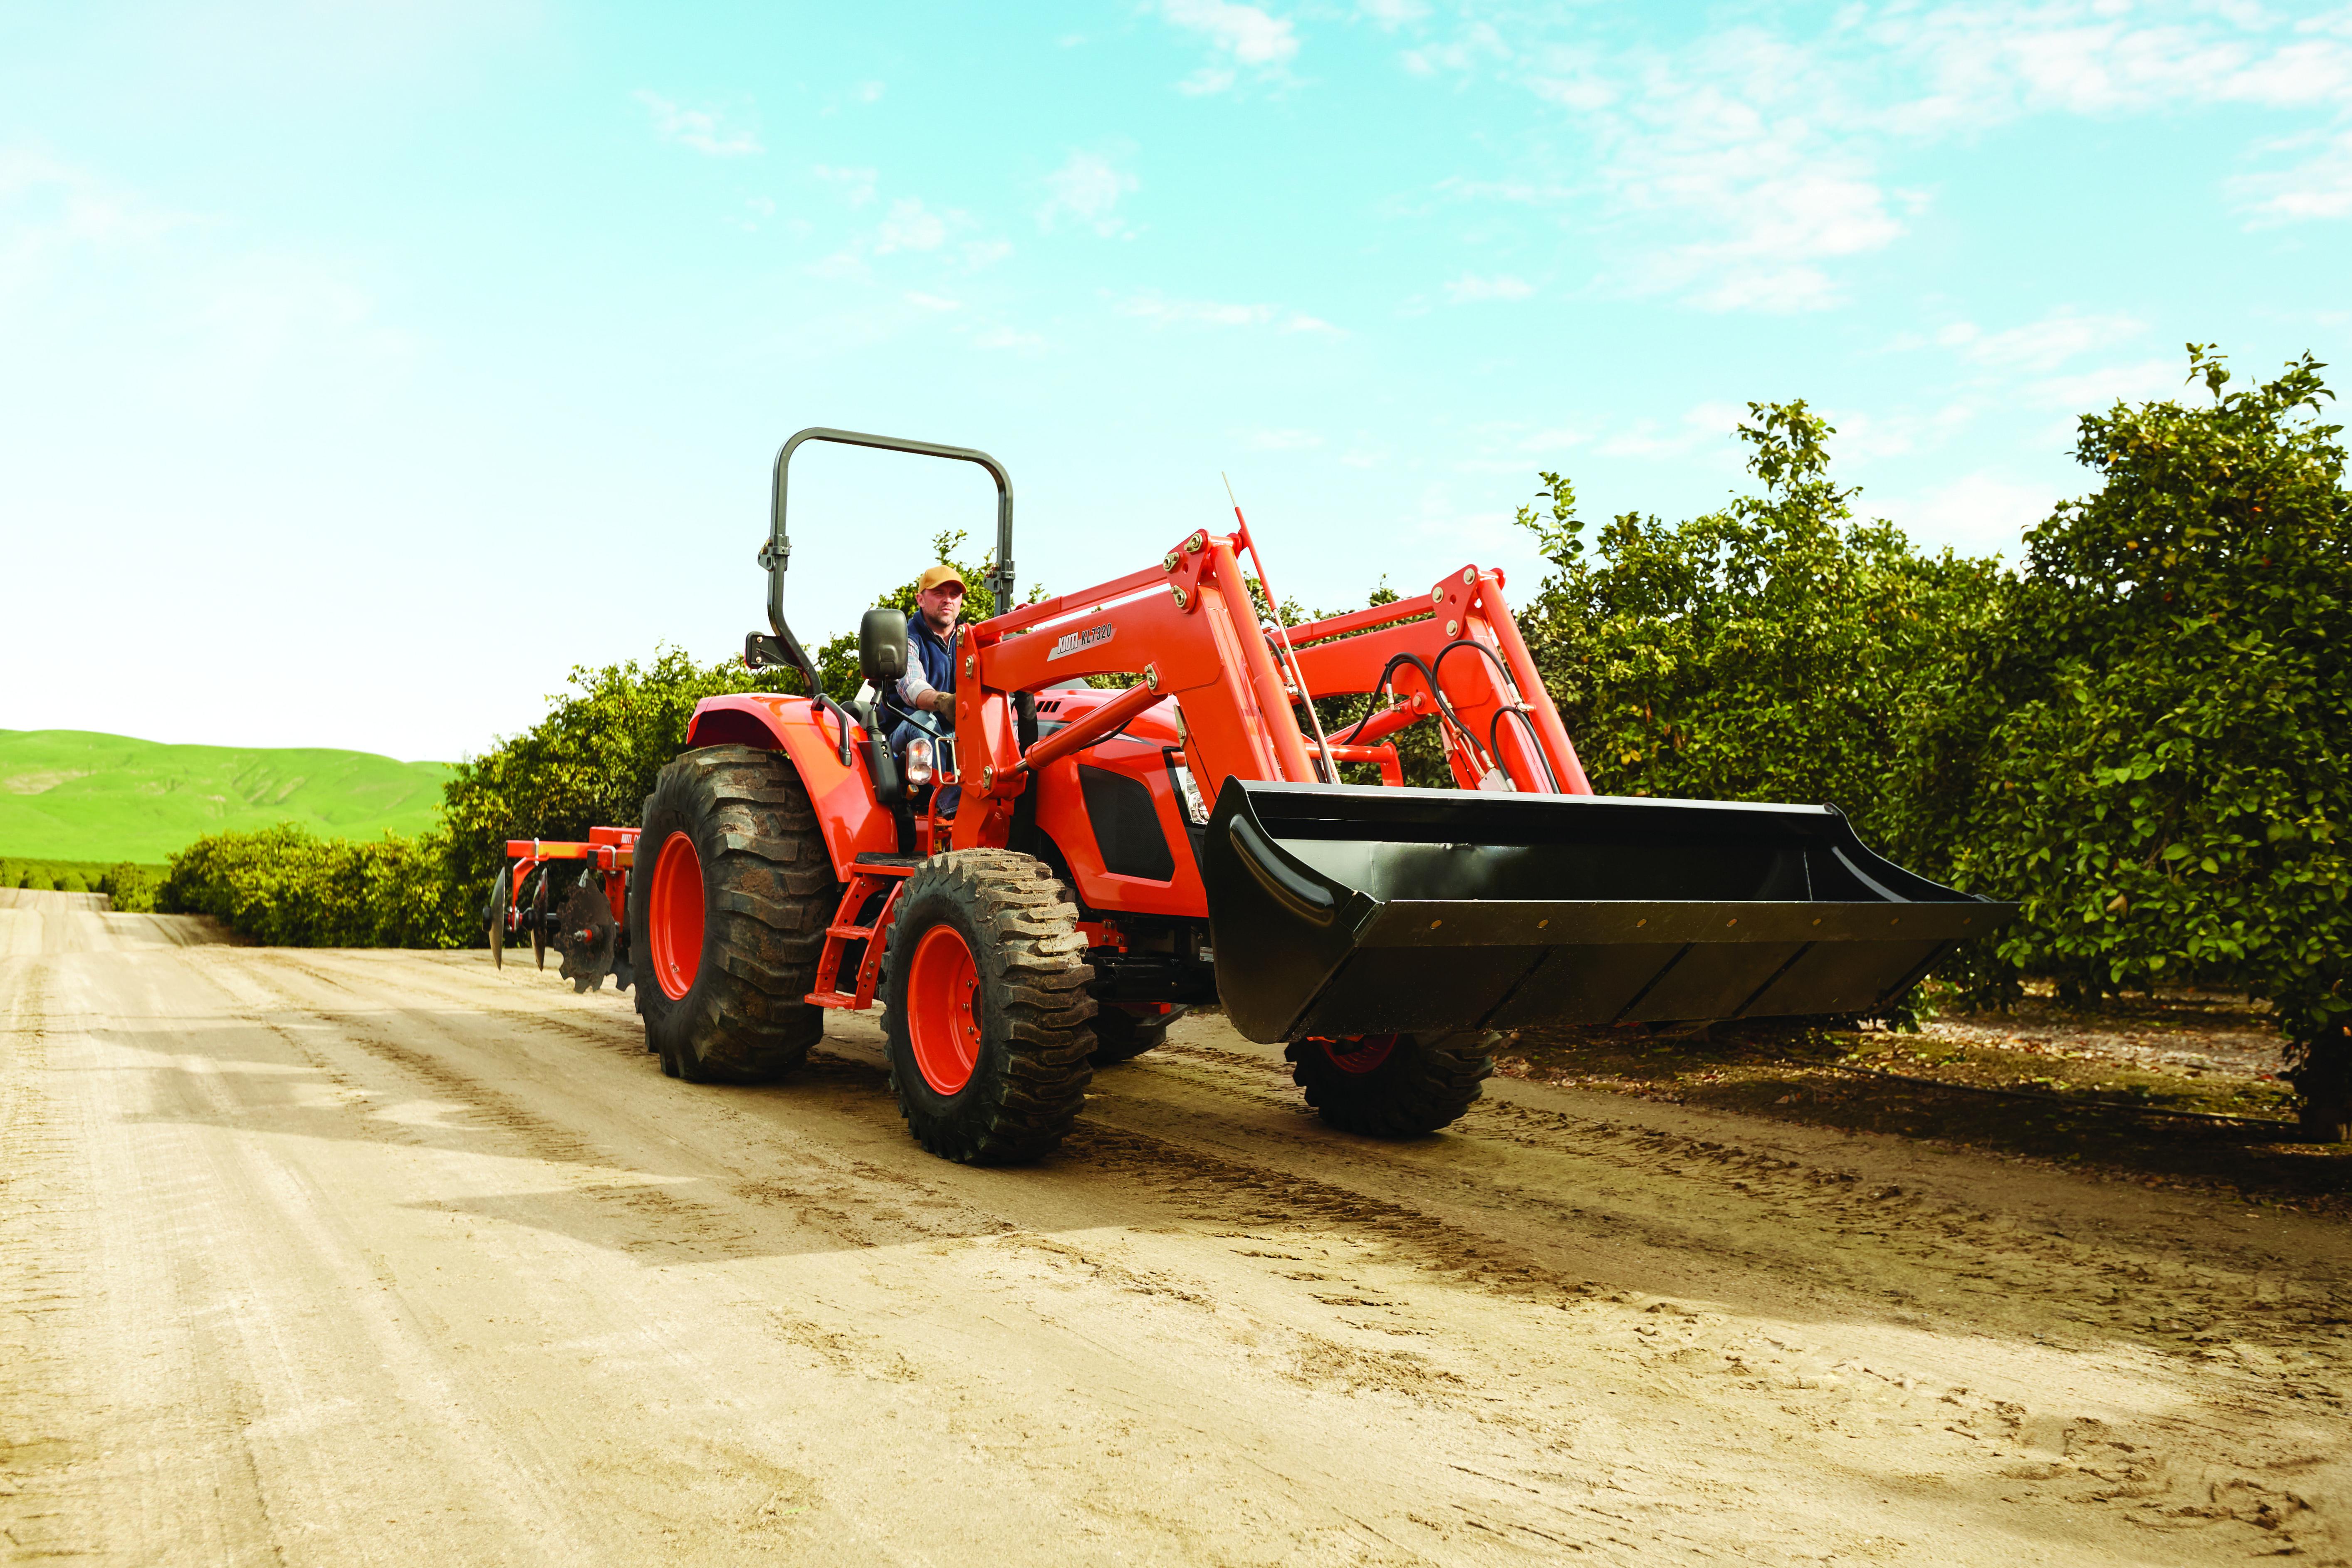 KIOTI RX6620 Utility Tractor